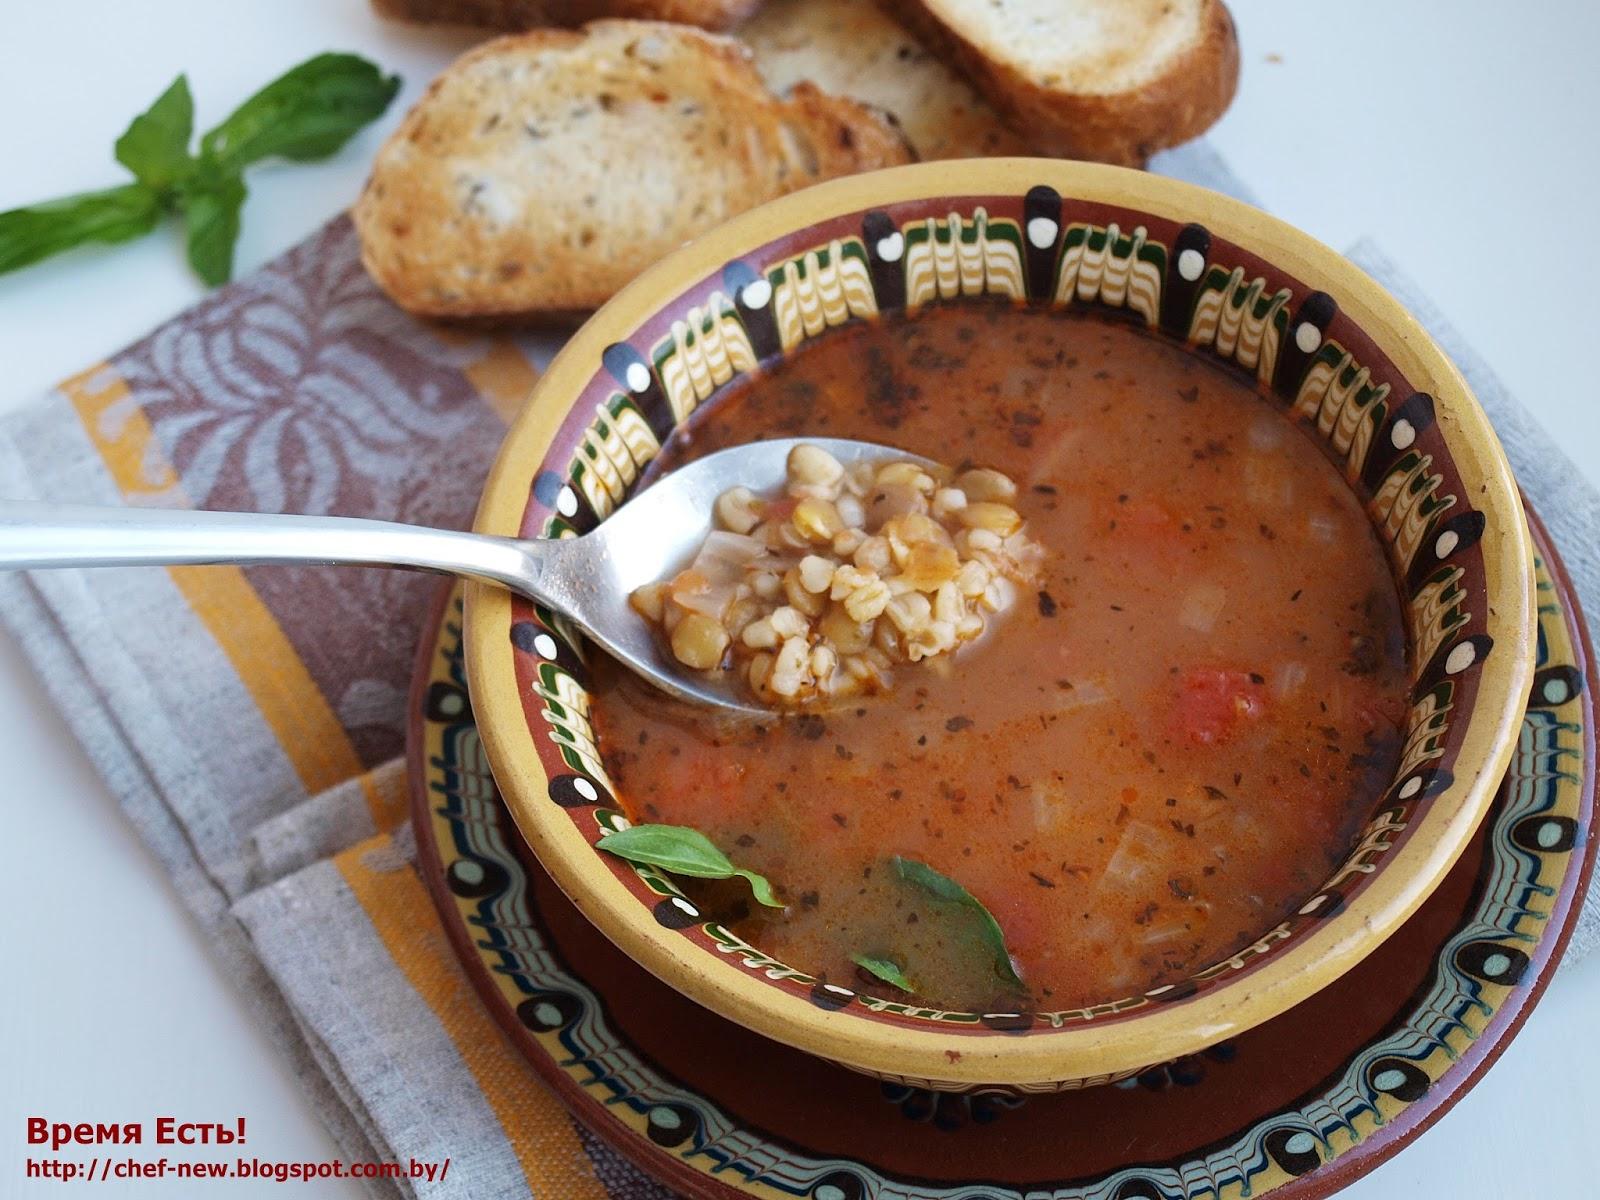 Когда добавлять гречку в суп